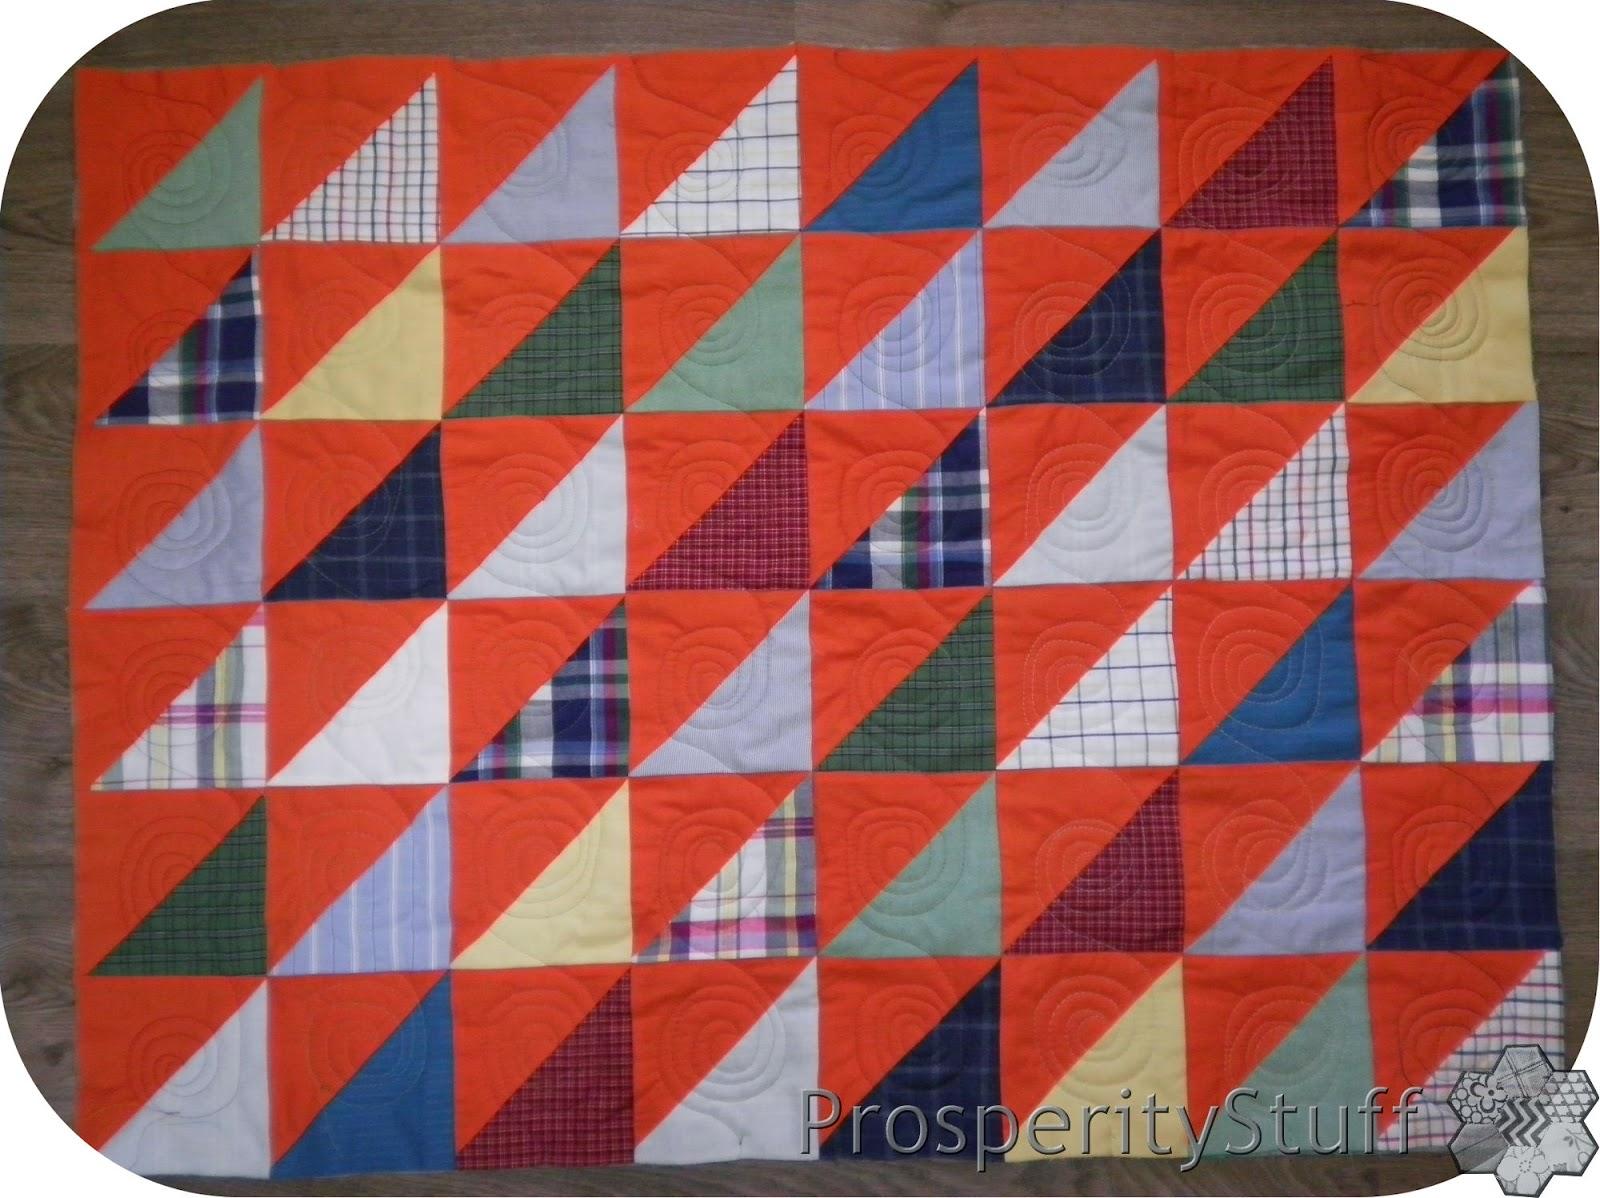 ProsperityStuff Half-Square-Triangle Quilt - solids & plaids